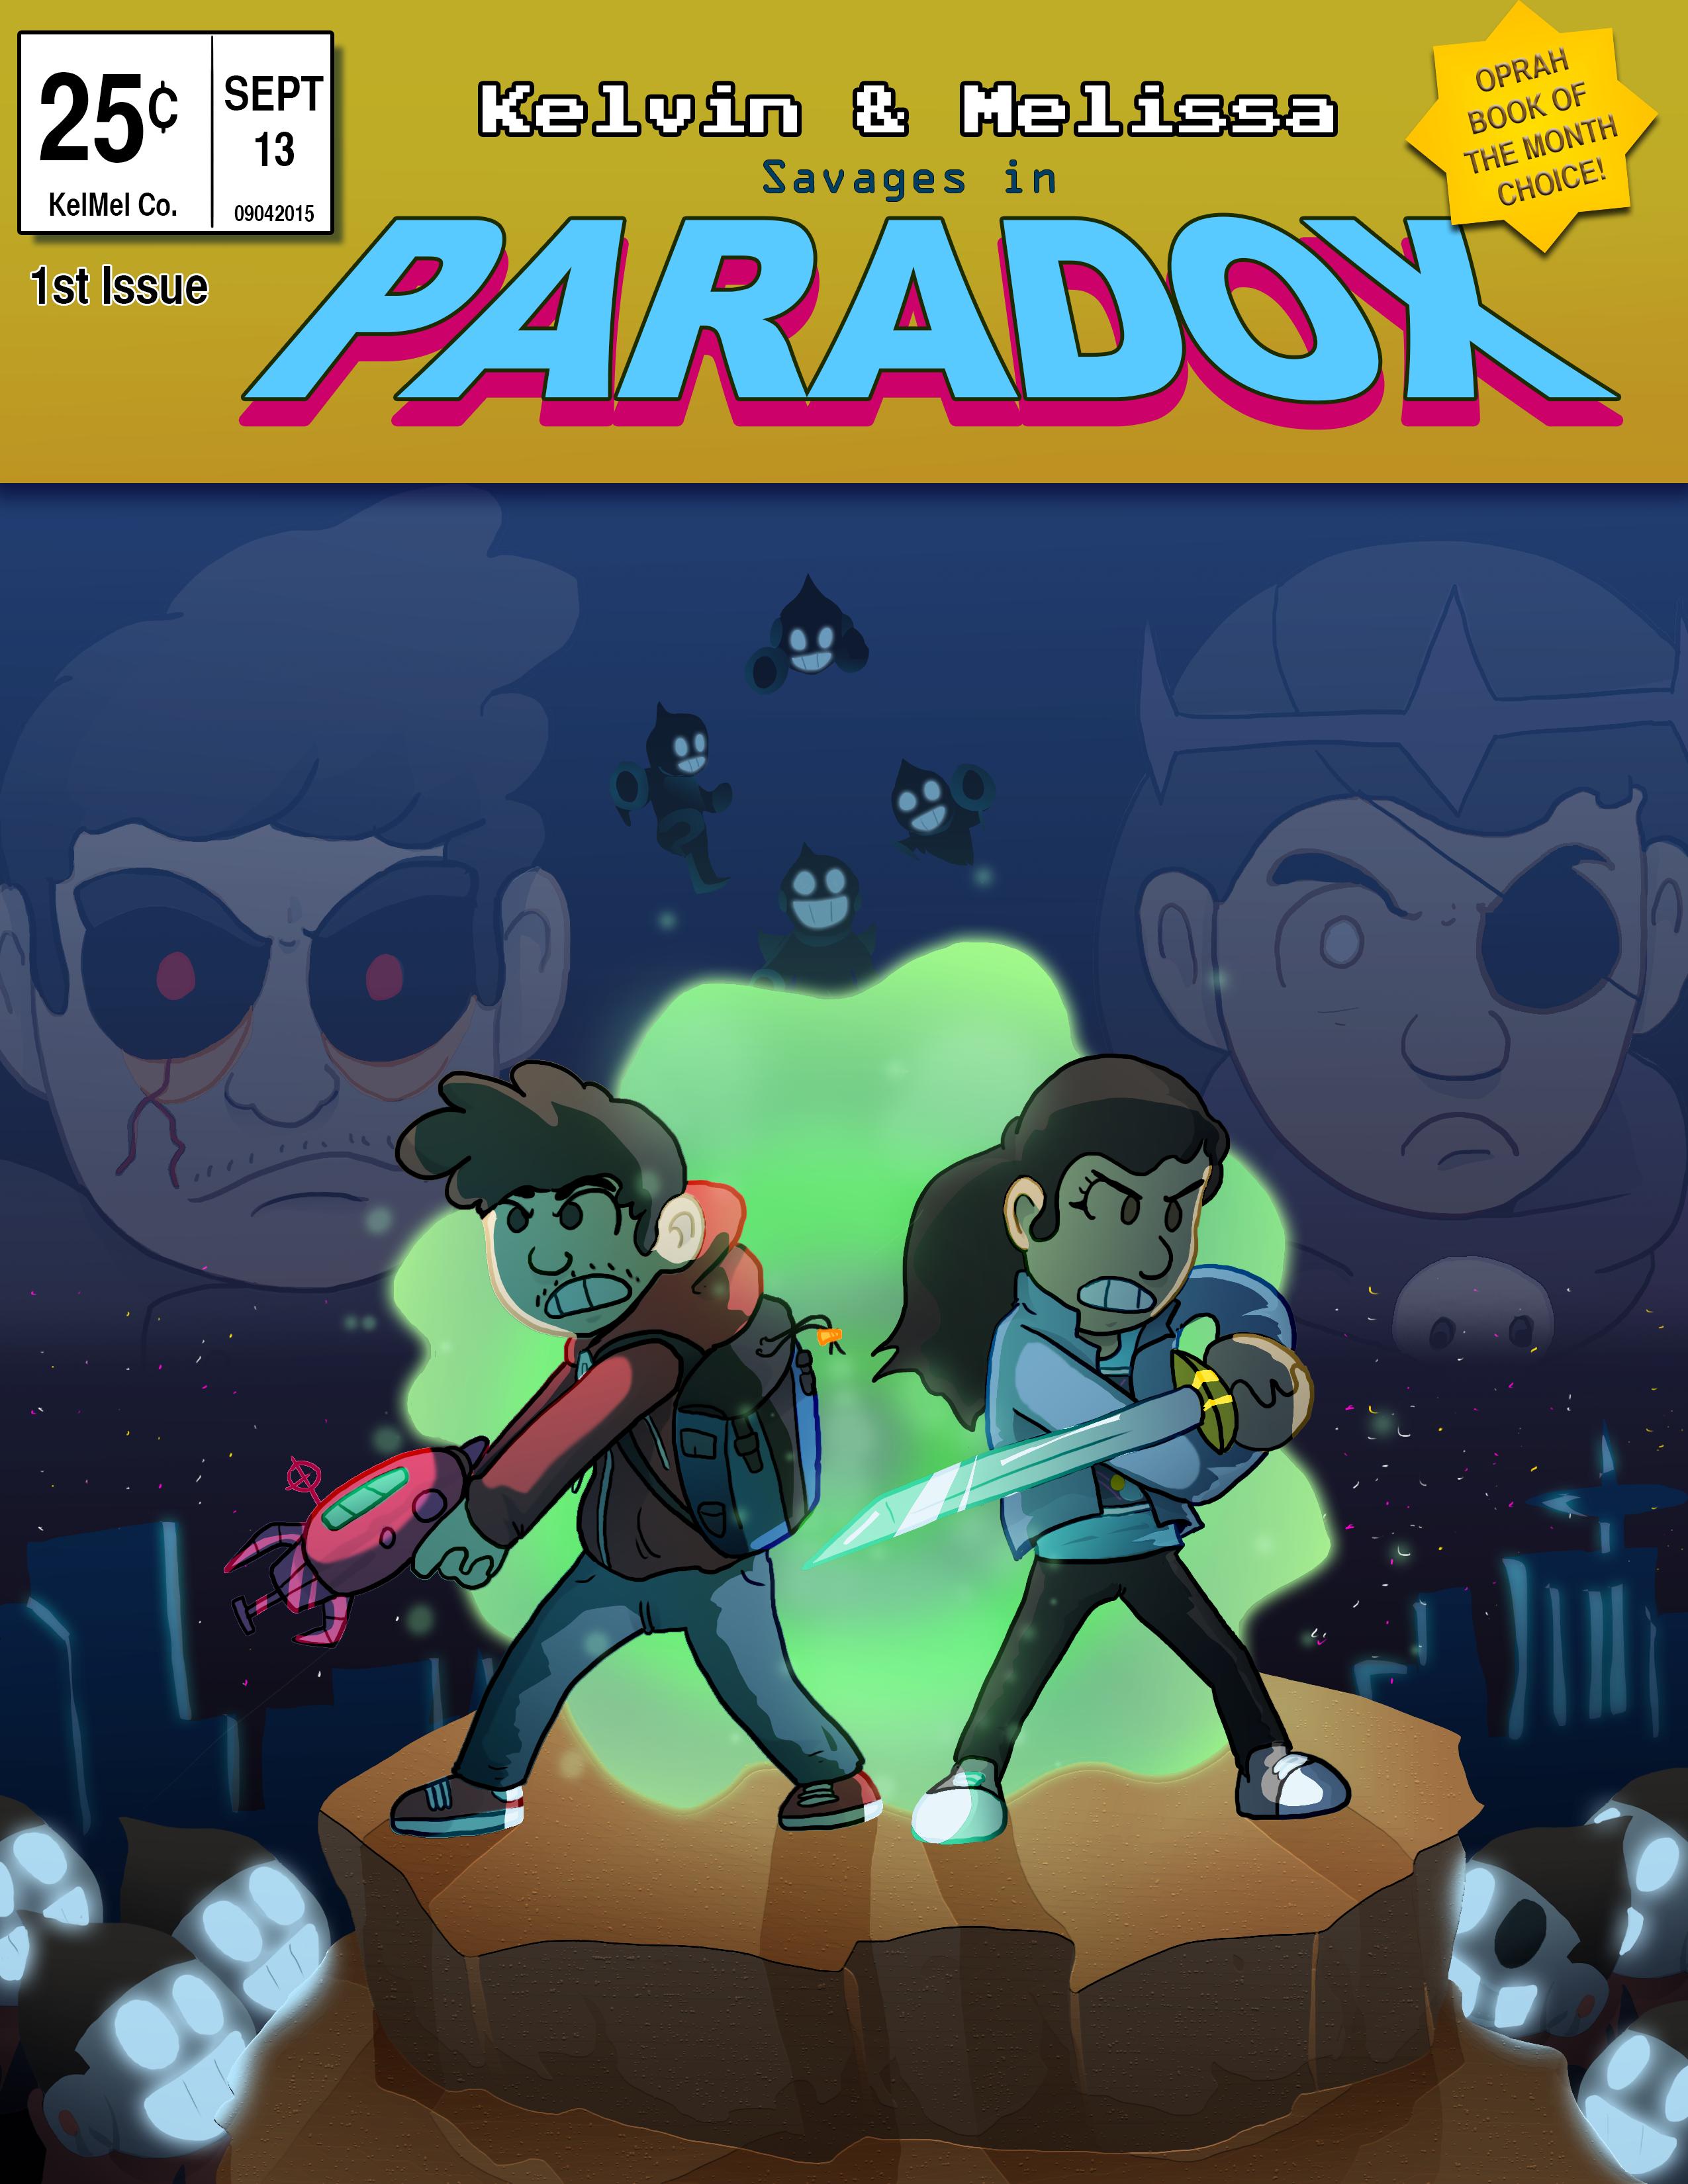 SAVAGES in PARADOX!